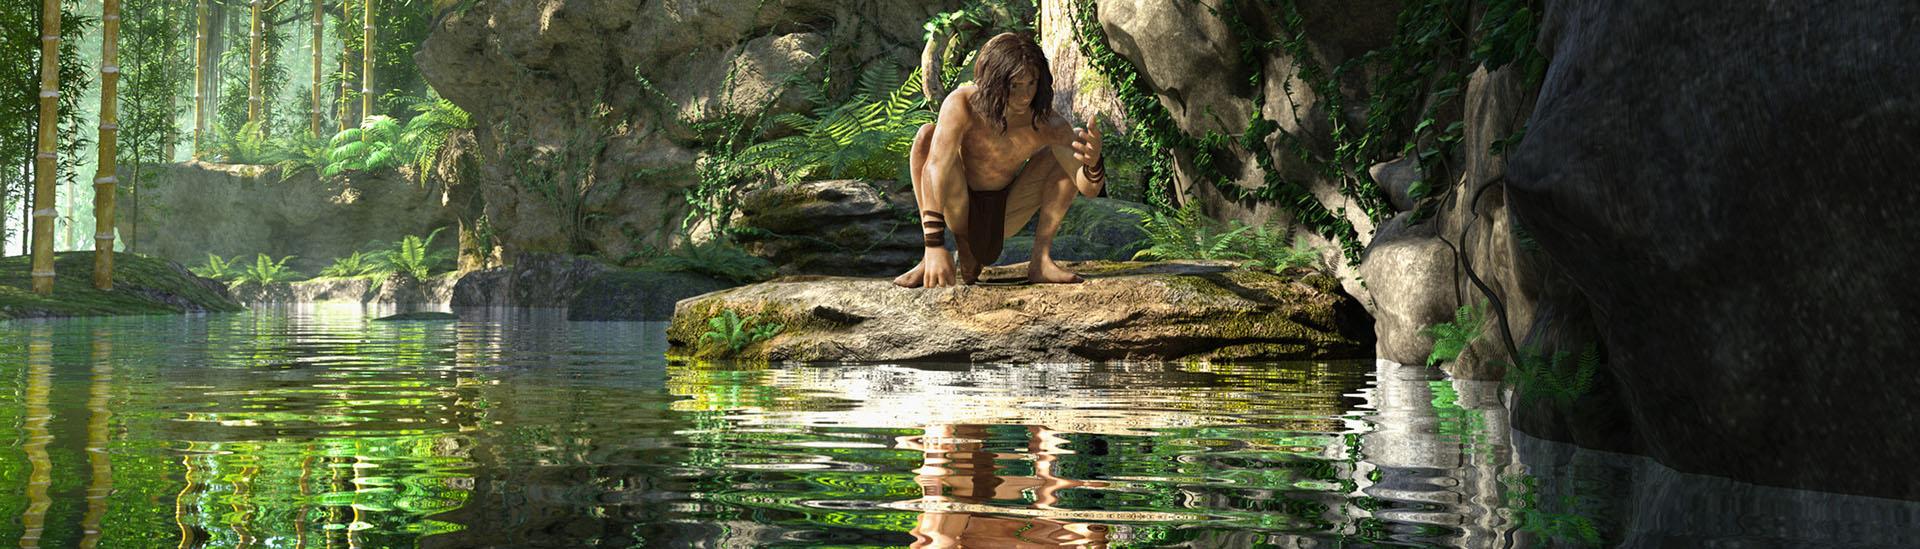 Baner filmu 'Tarzan. Król Dżungli'